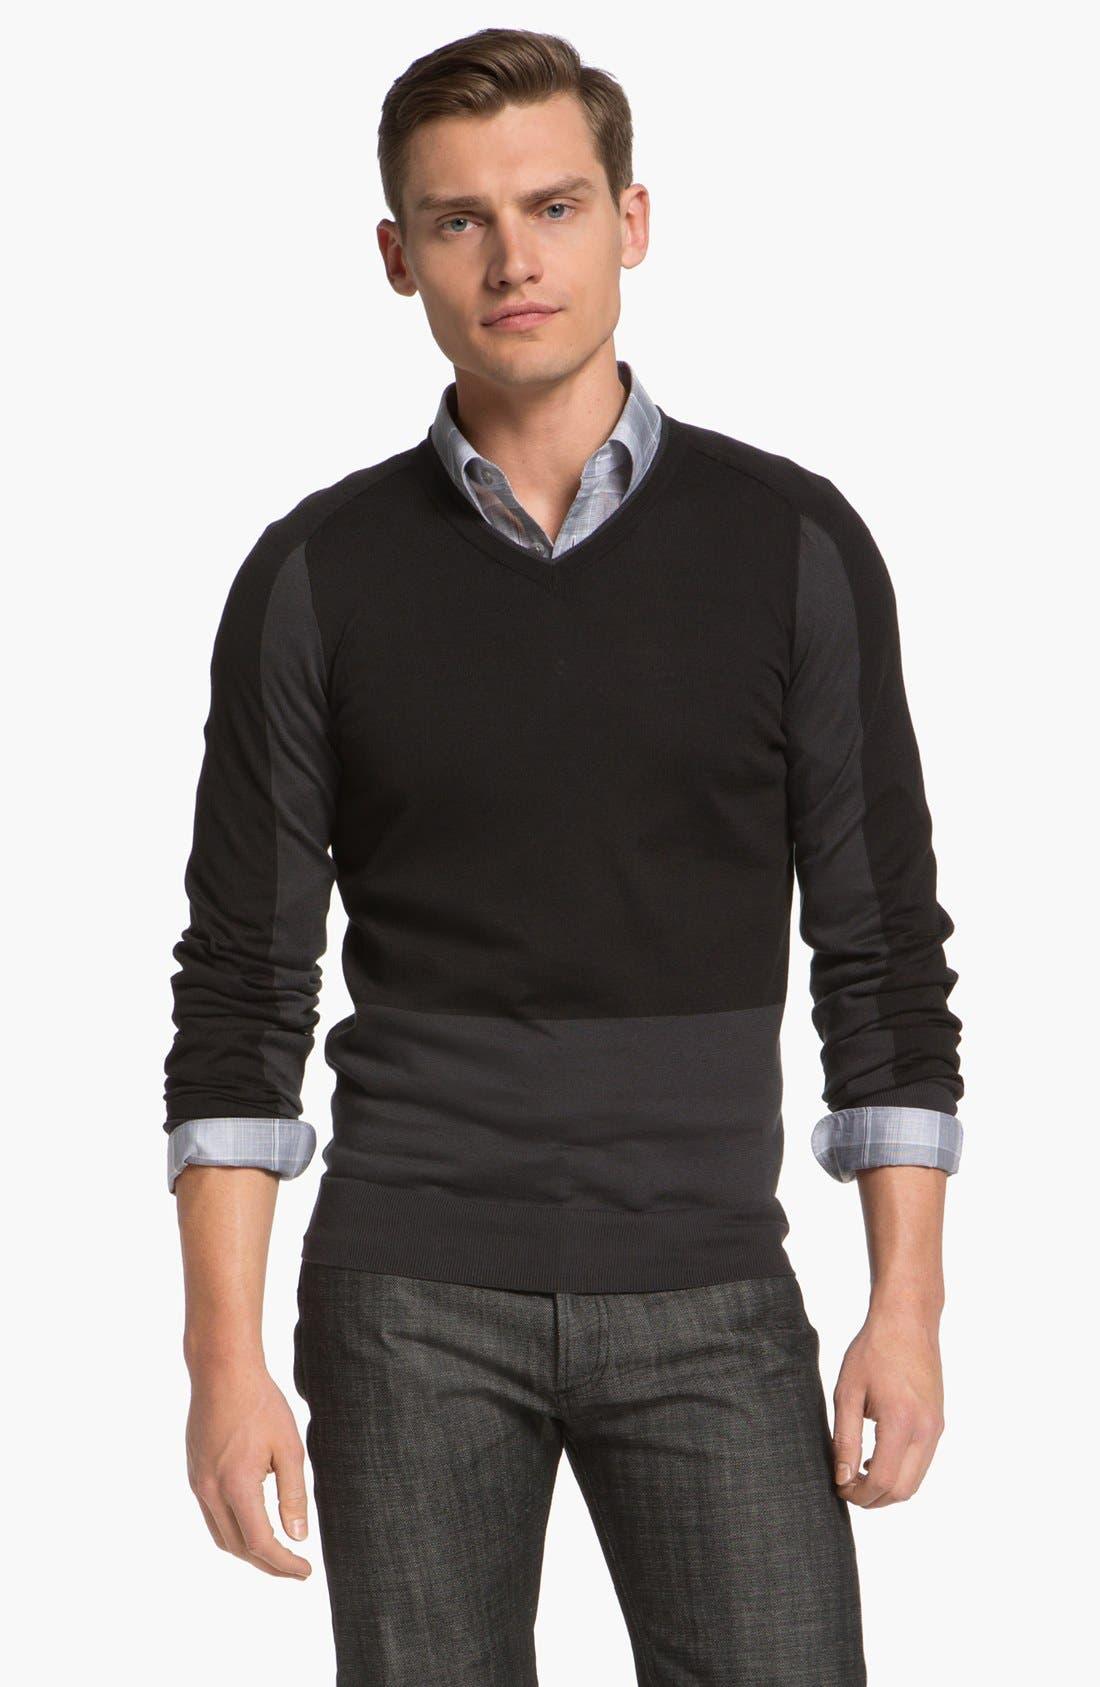 Alternate Image 1 Selected - Z Zegna Colorblock Sweater